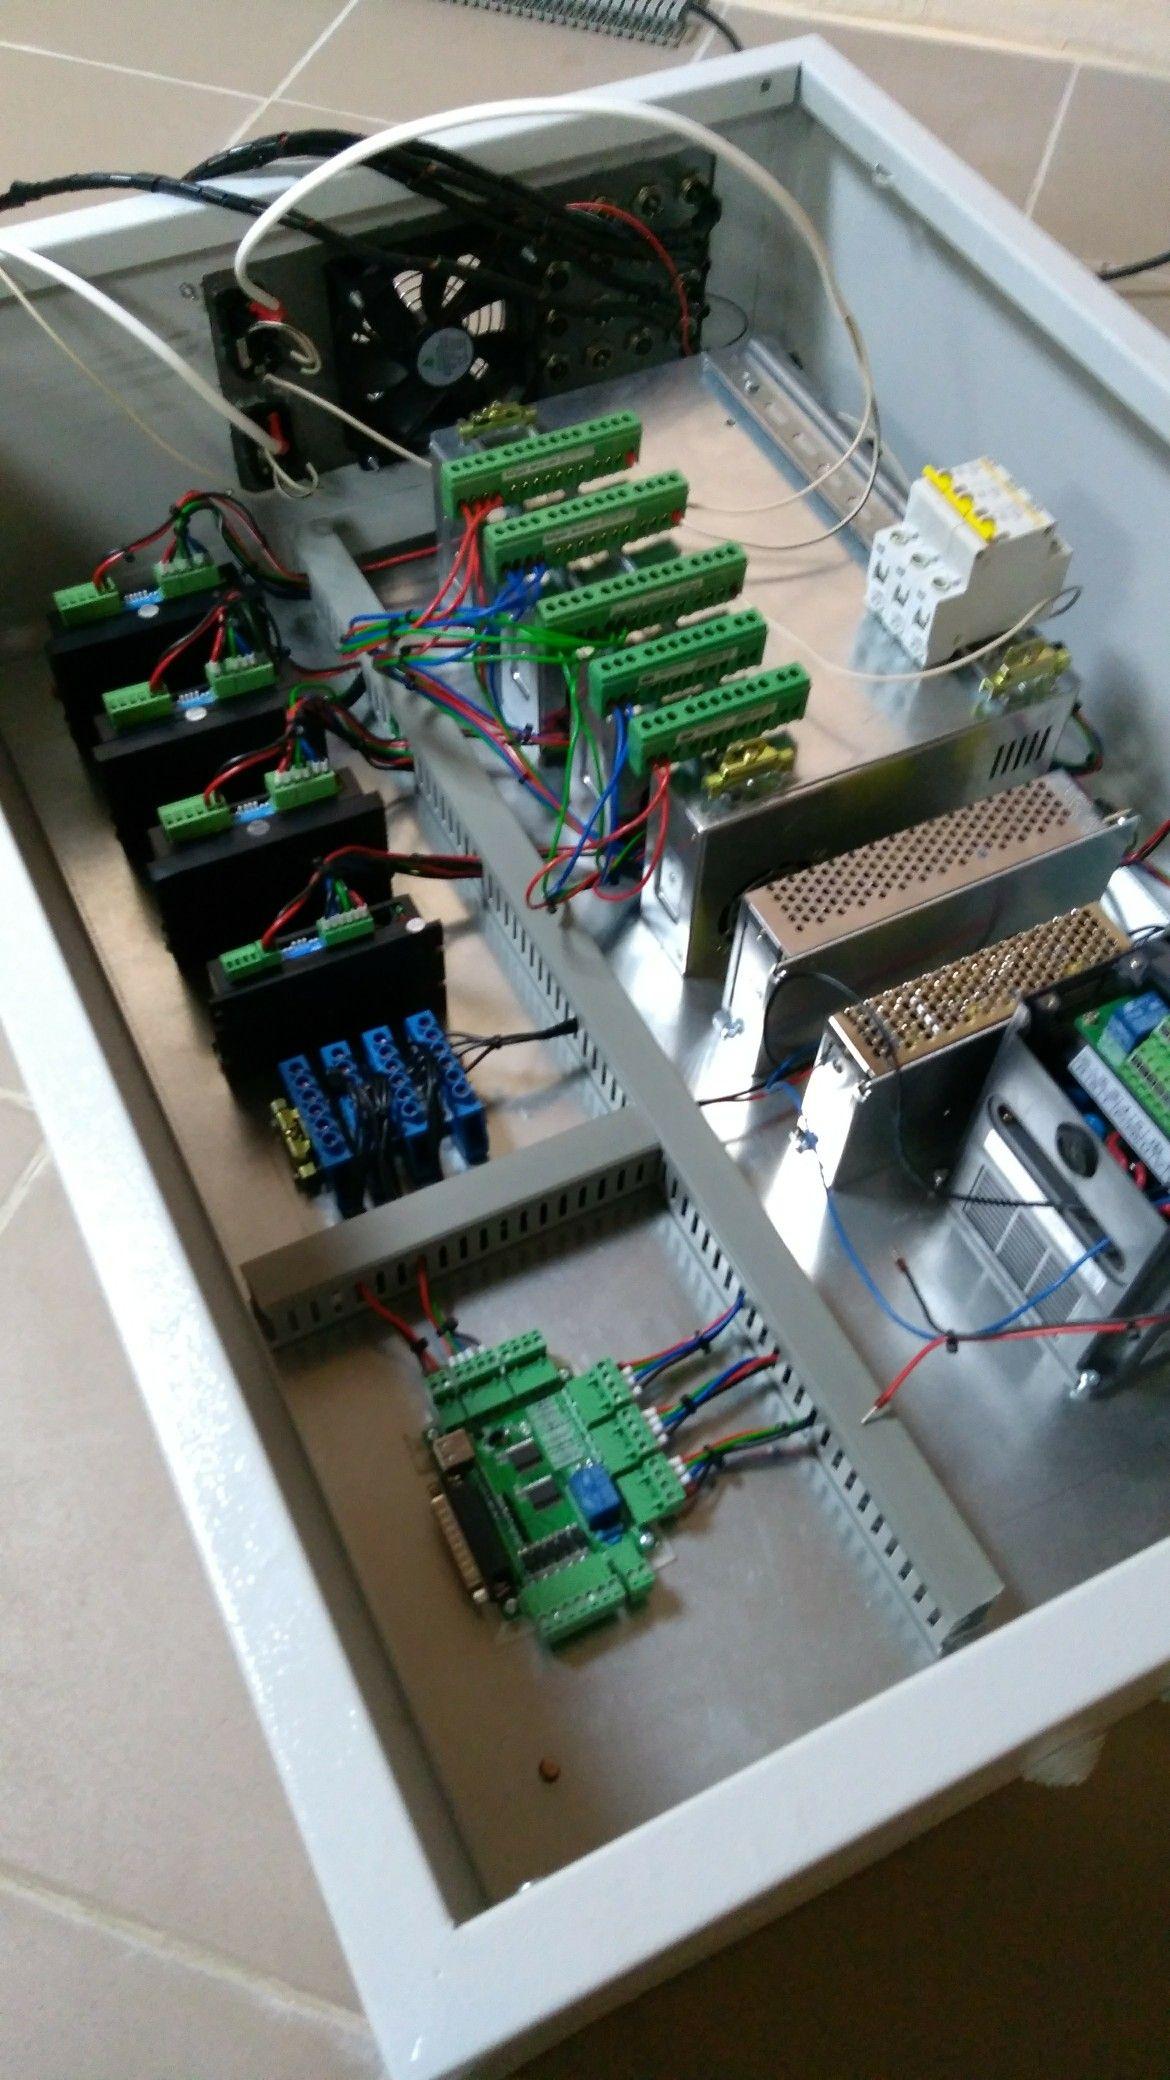 Pin By Stan Khalipa On Selvox Cnc Build Log Cnc Controller Cnc Router Machine Diy Cnc